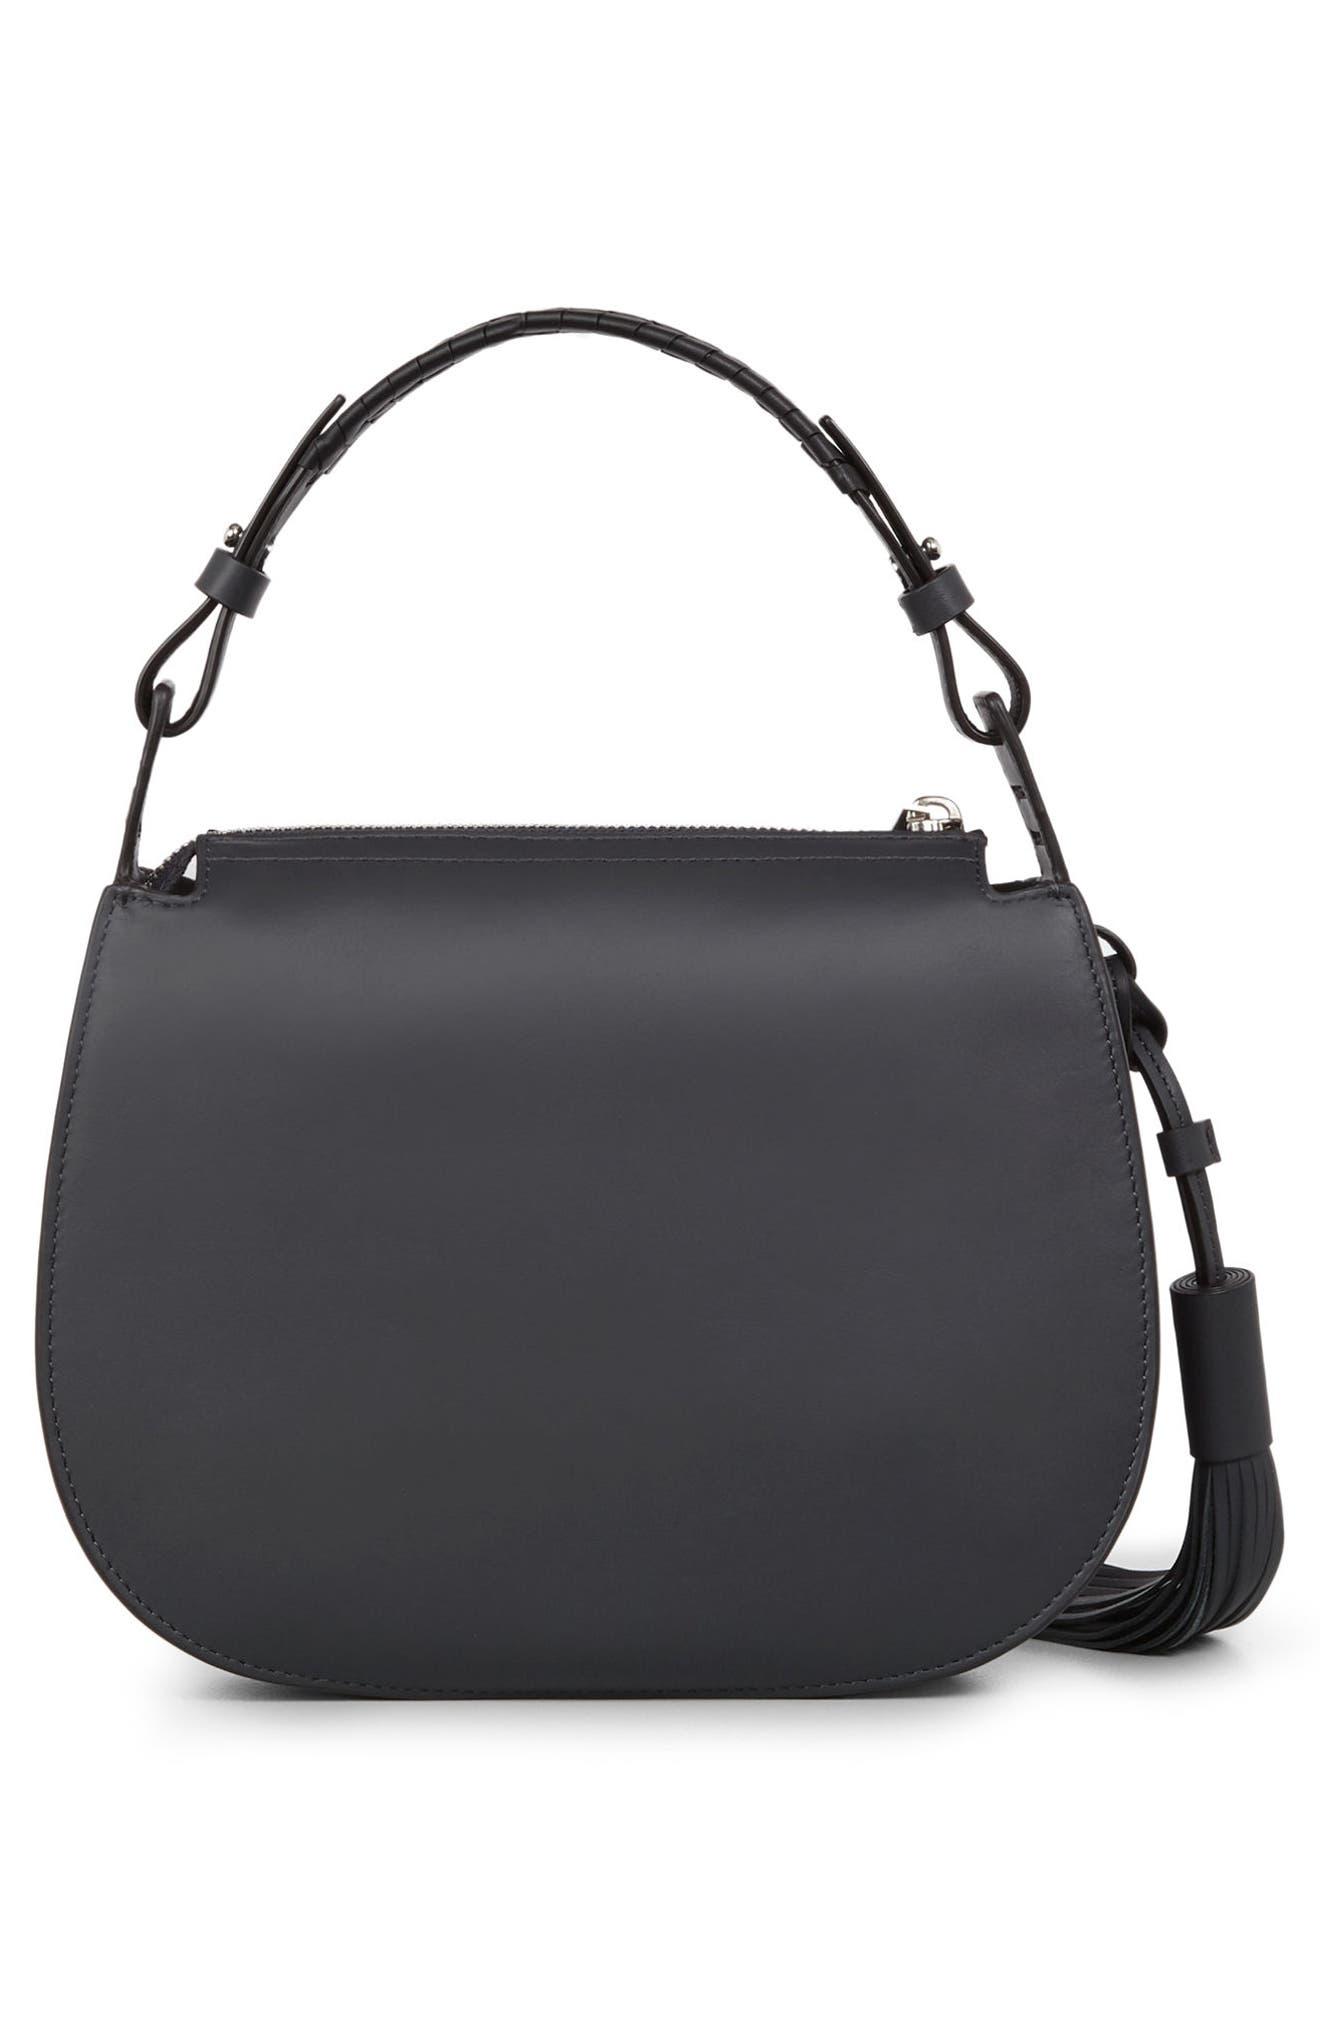 Kepi Leather Crossbody Bag,                             Alternate thumbnail 3, color,                             Navy Black